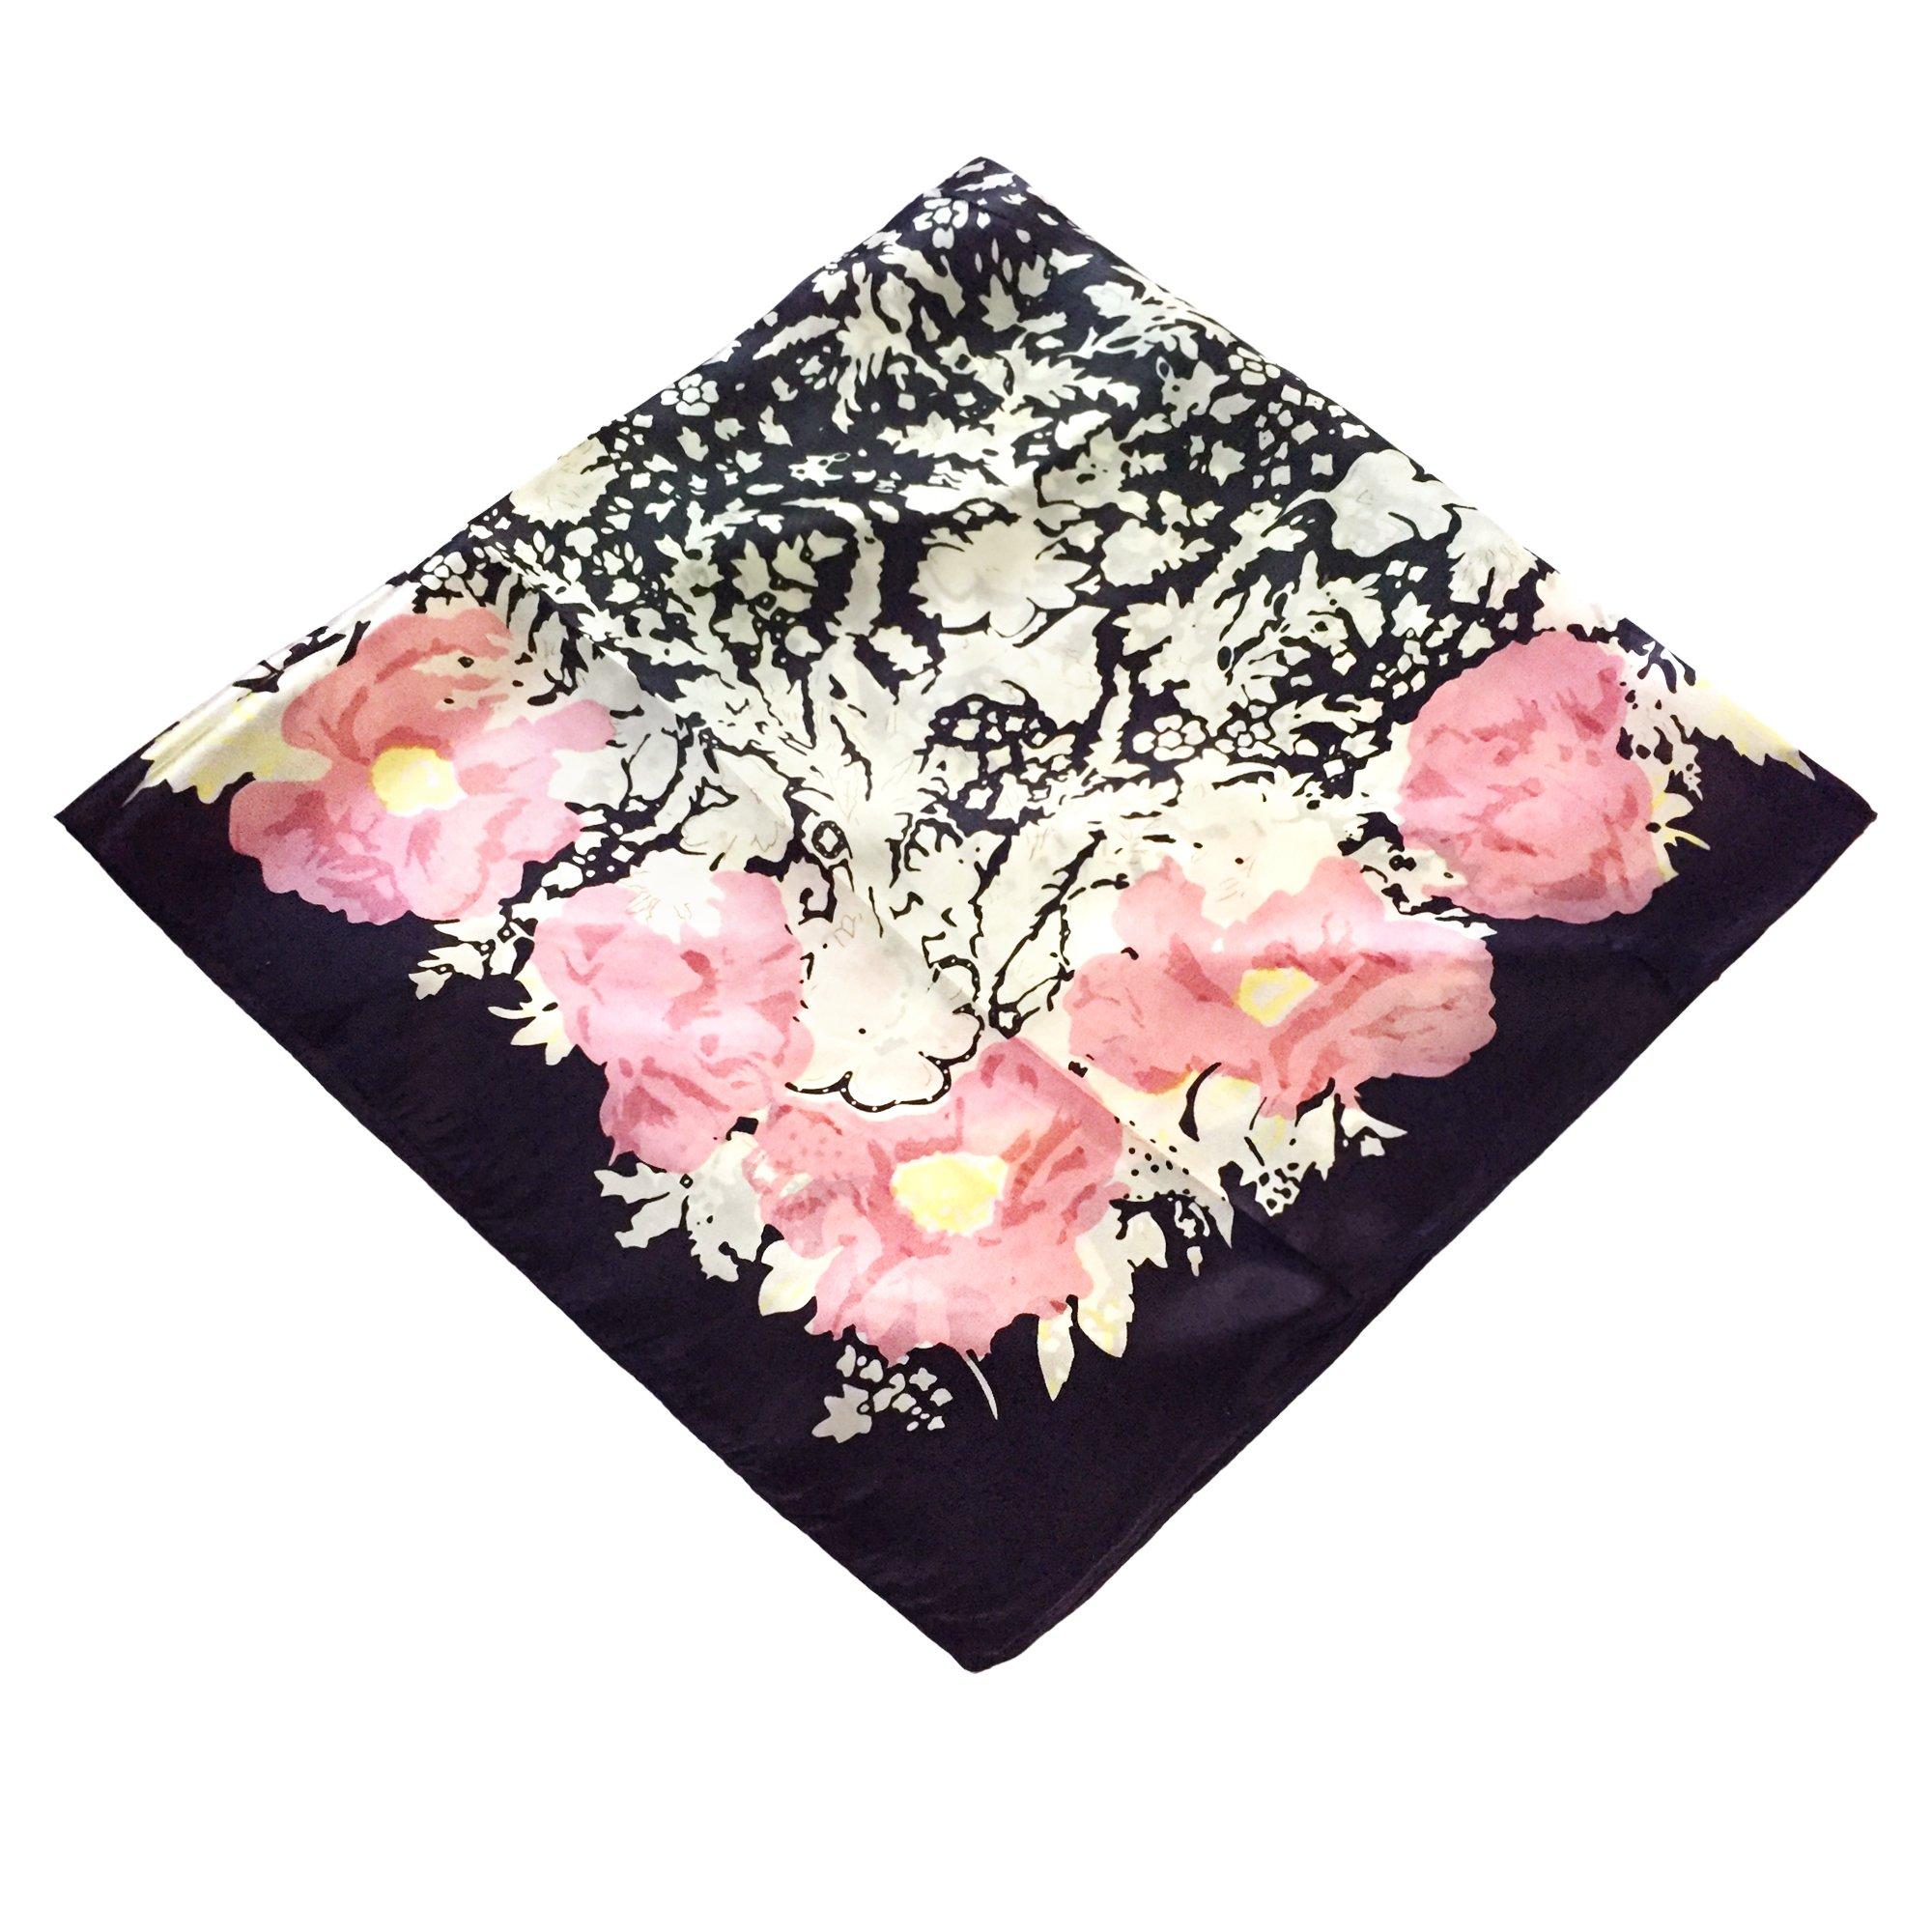 Women's Graphic Print 100% Silk, Silk Scarf Square, 33X33 Inches